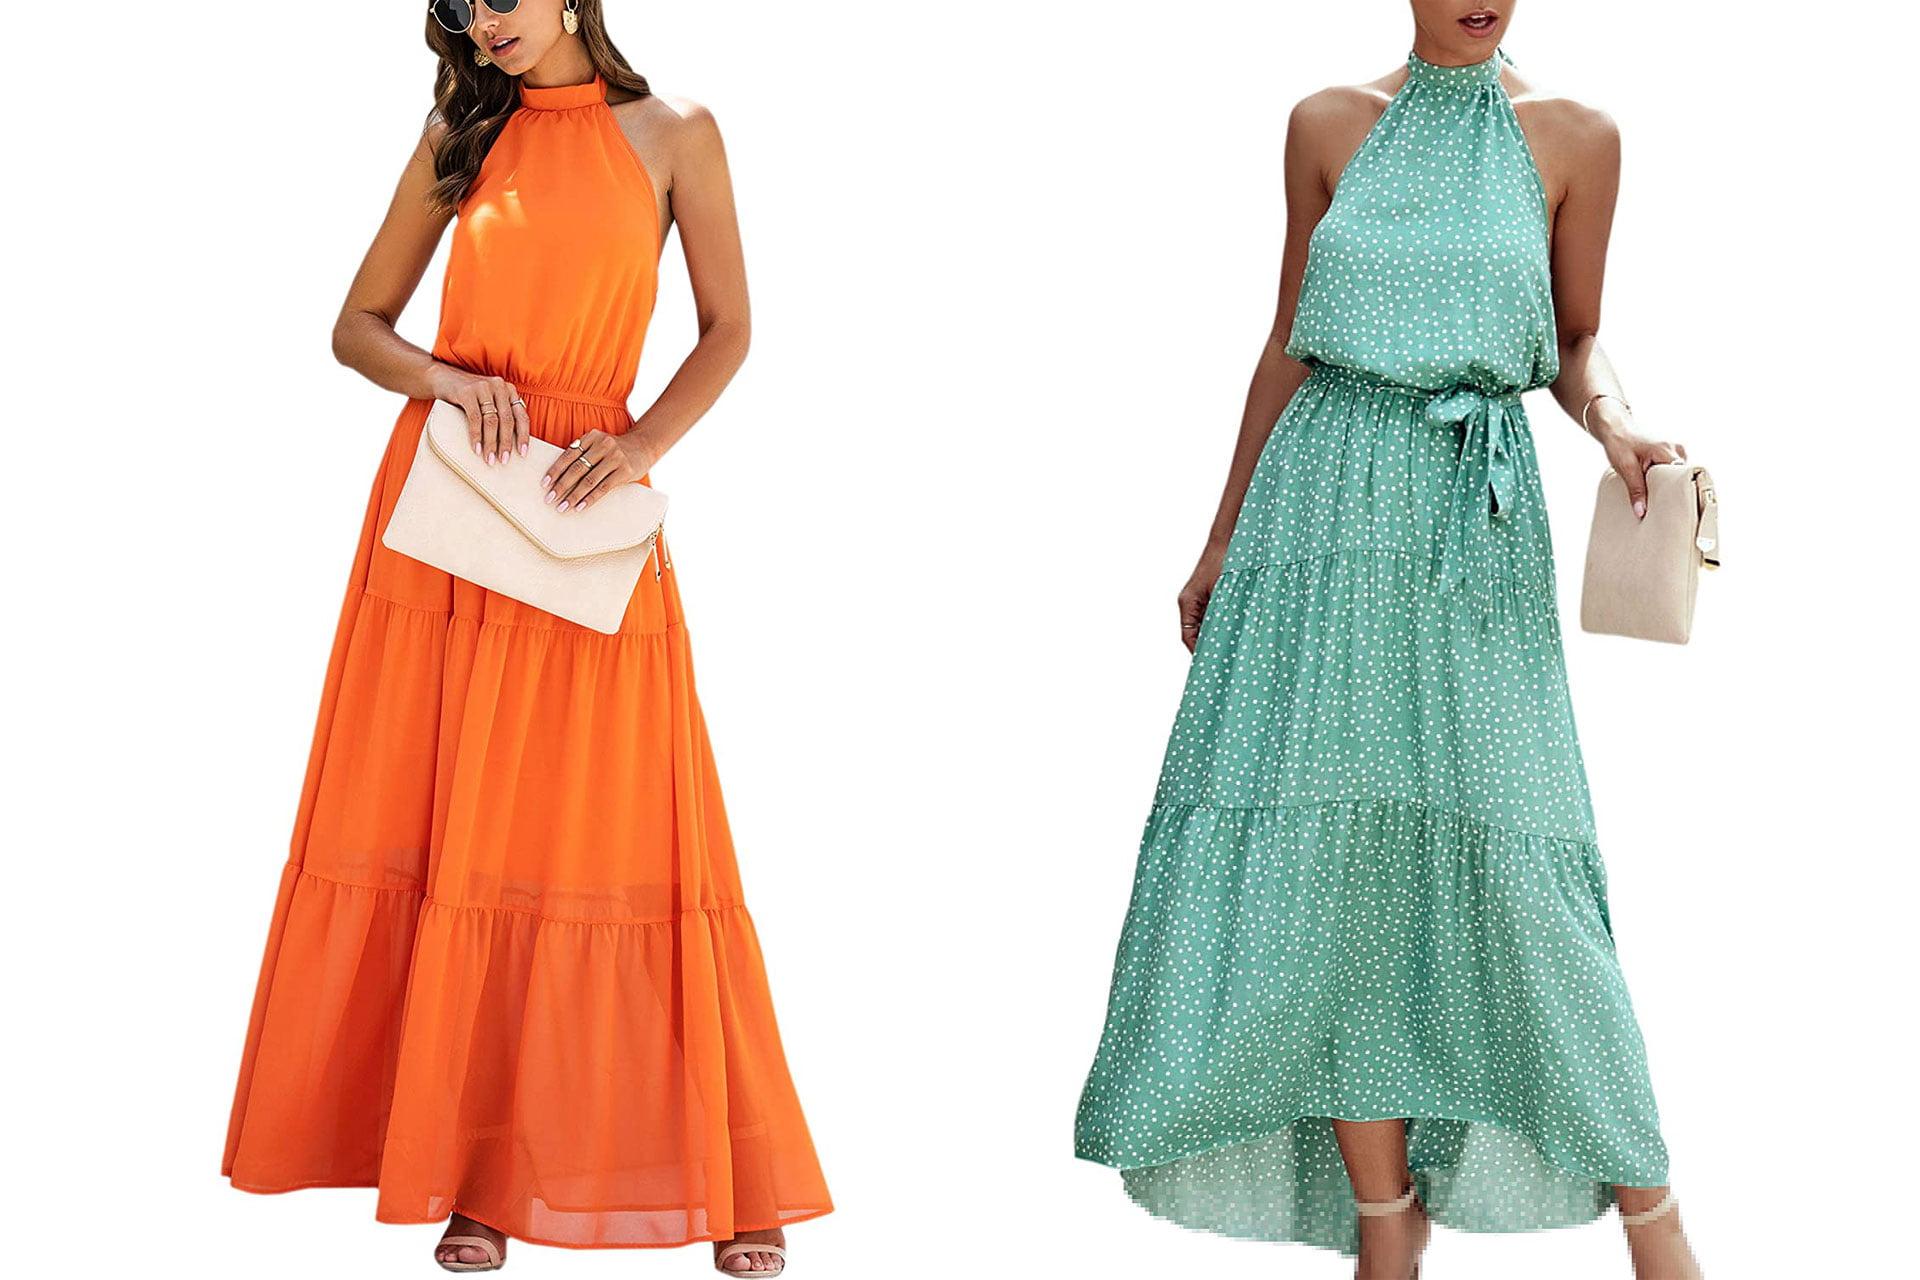 ECOWISH Halter Neck Boho Floral Print Sleeveless Maxi Dress